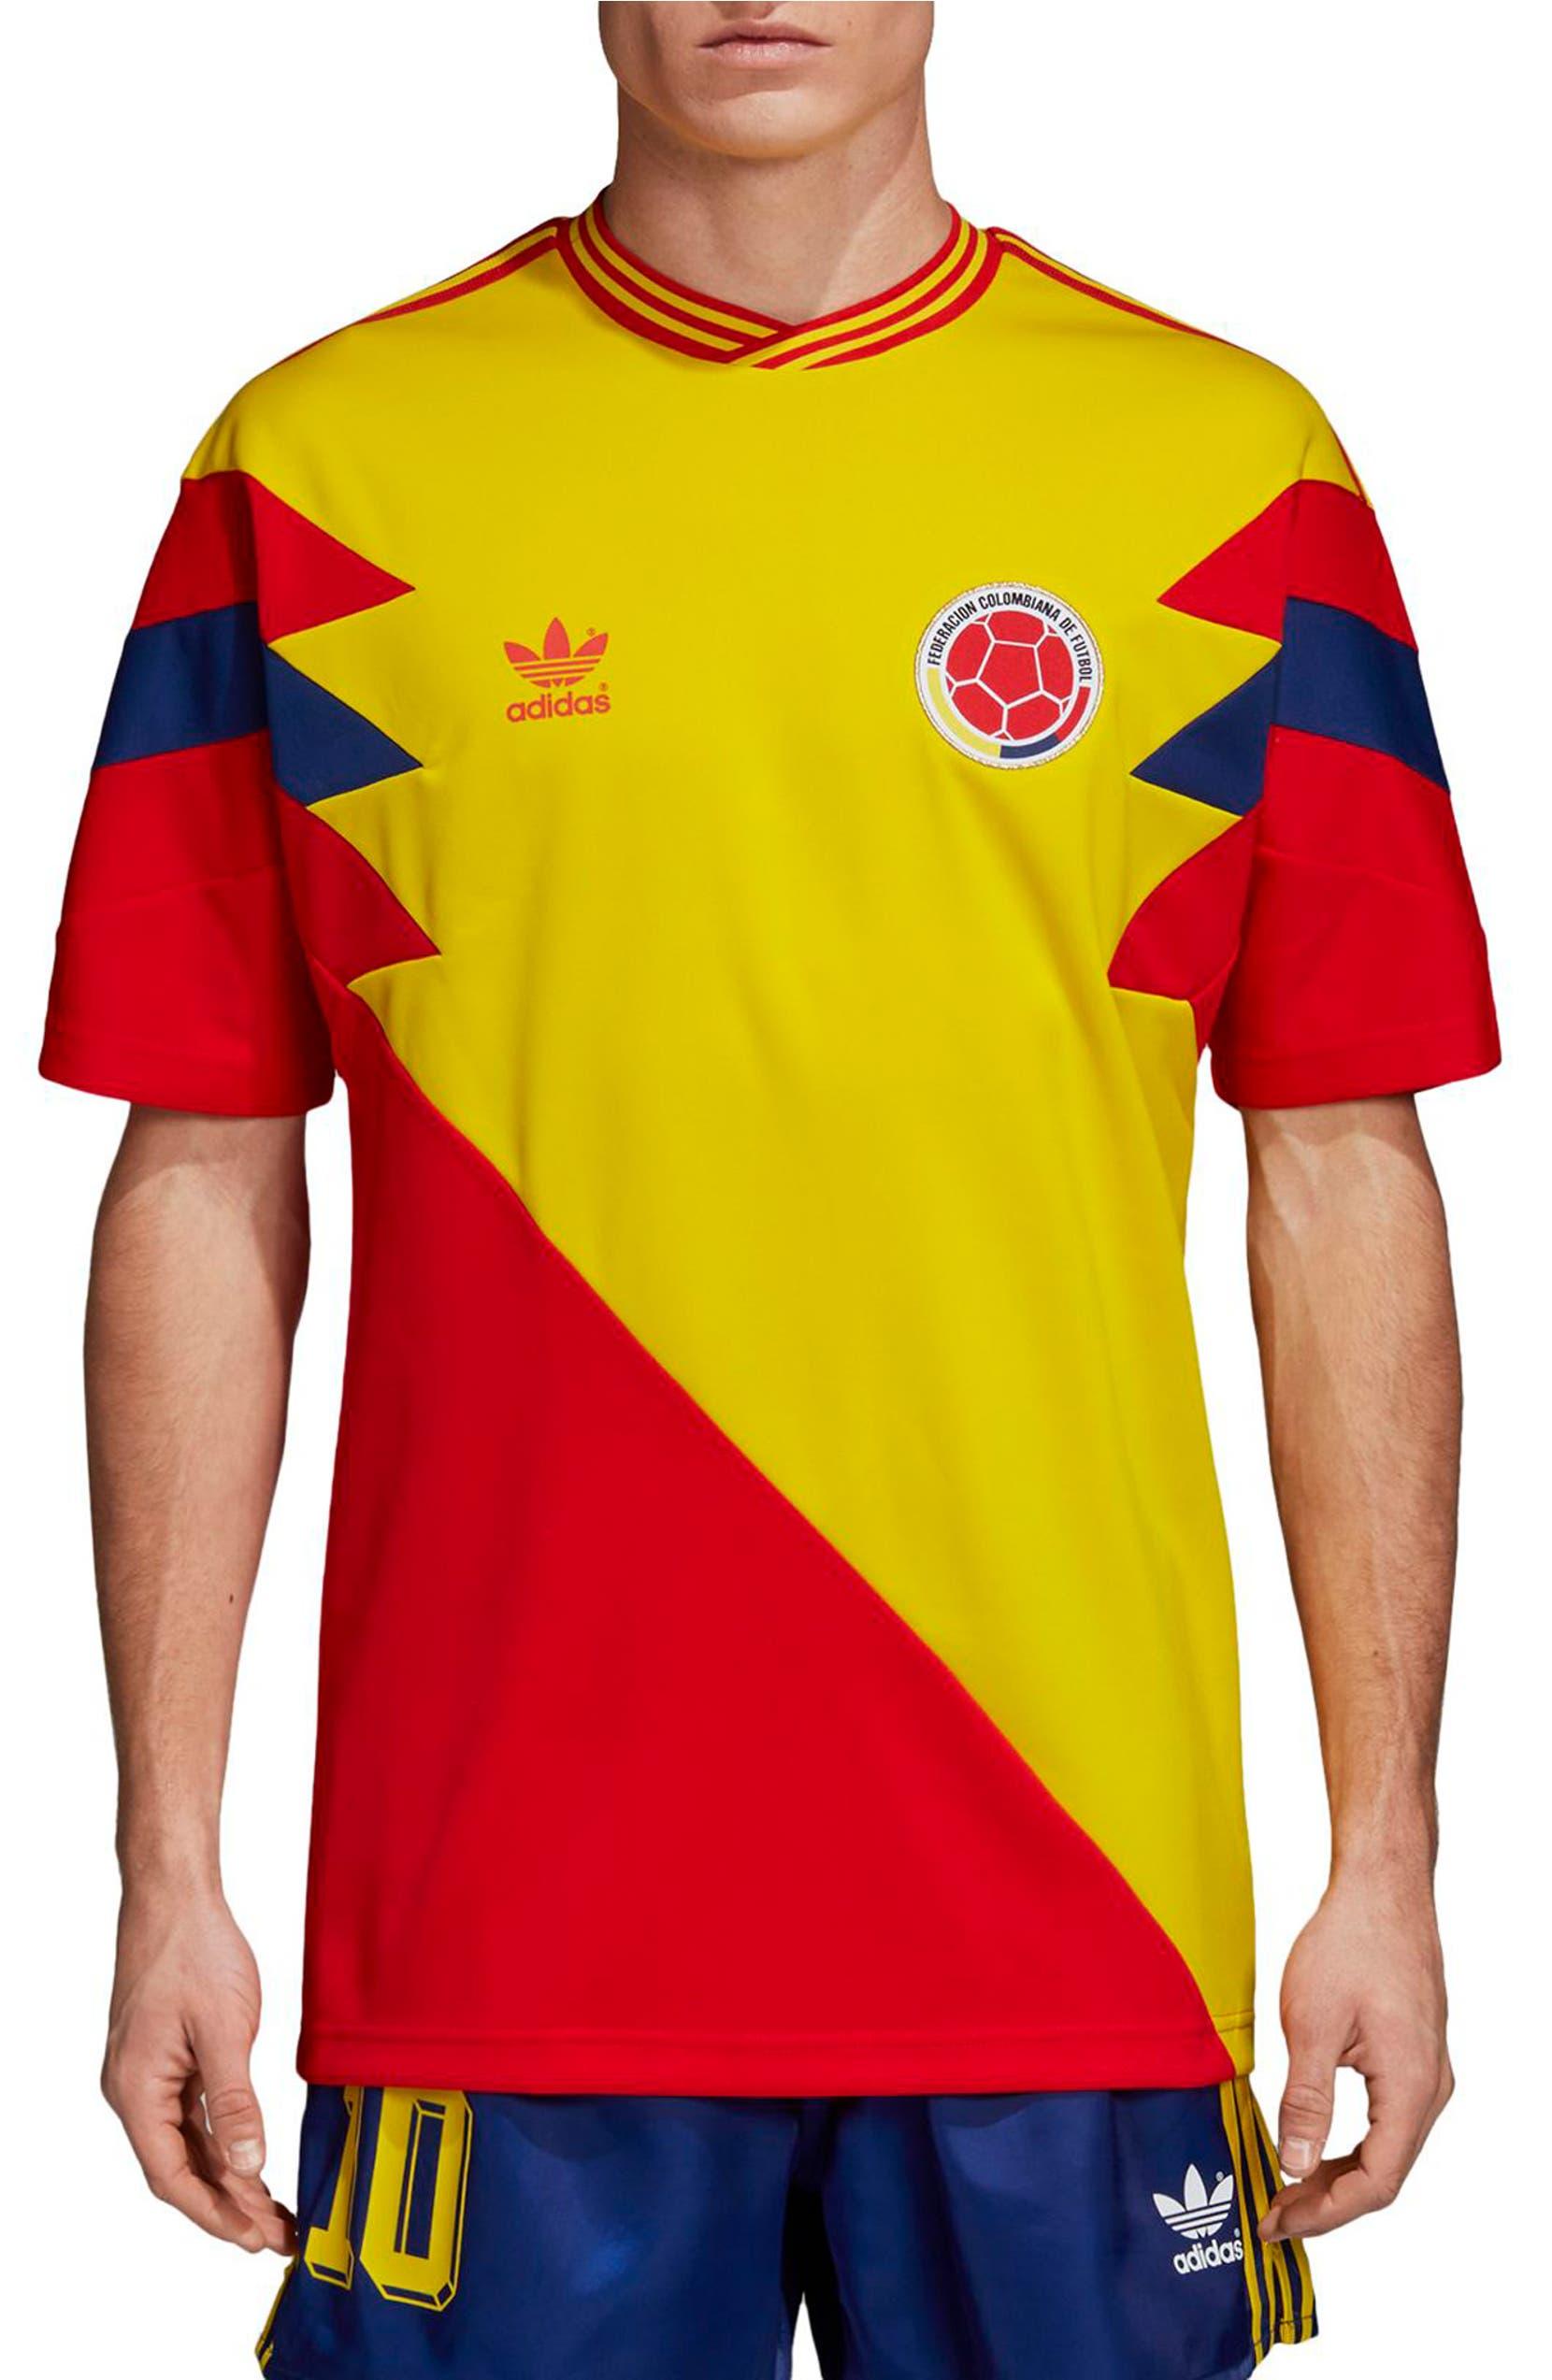 adidas Originals Colombia Mash-Up Jersey  8e59cb4af